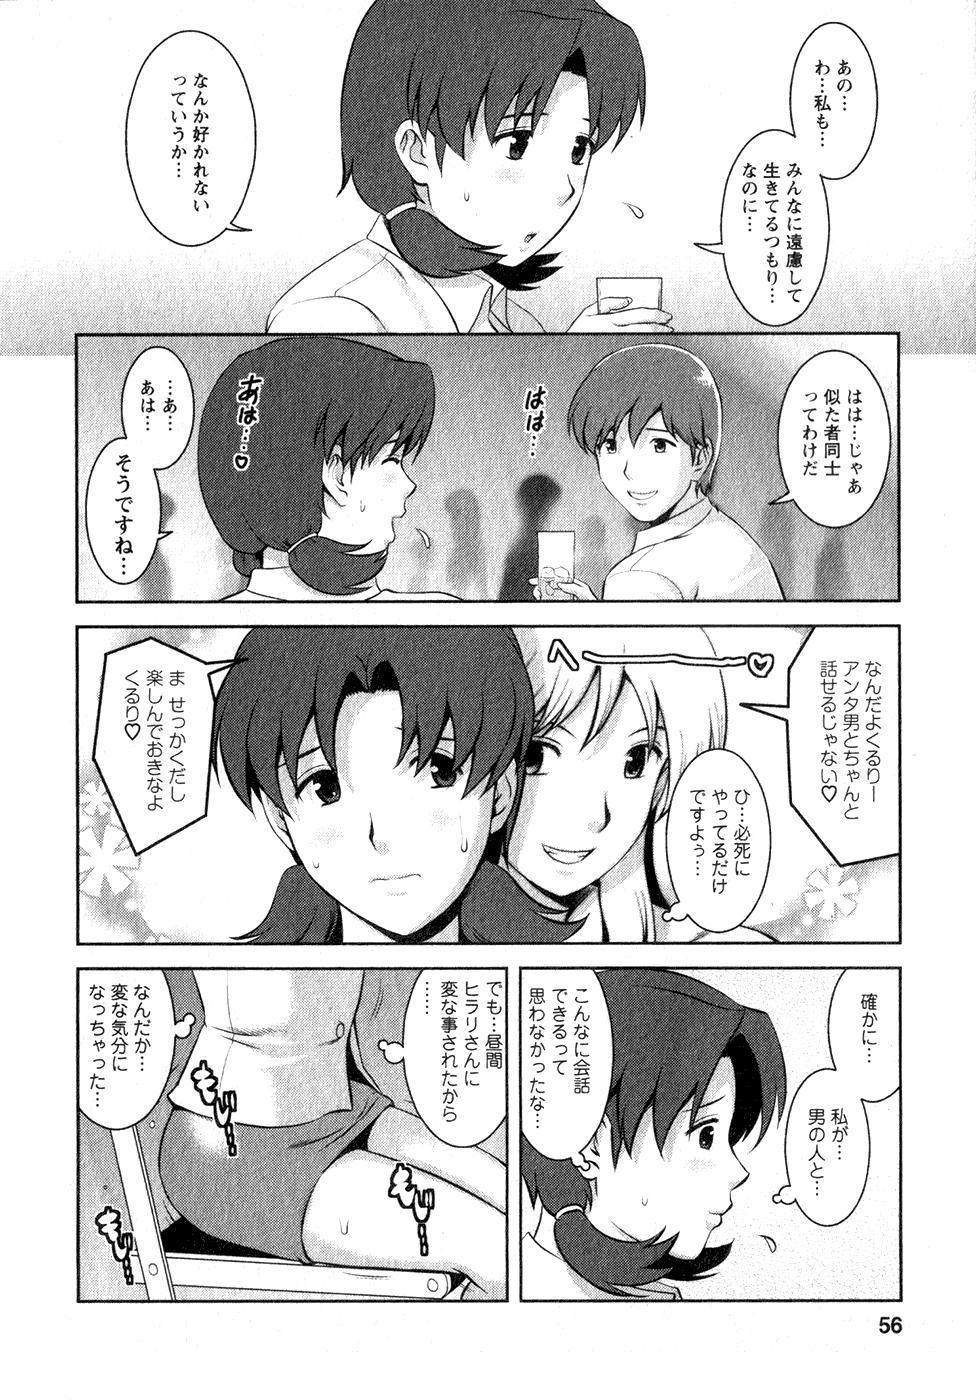 [Saigado] Kururi-san to Hirari-san Vol. 1 (Complete) 54